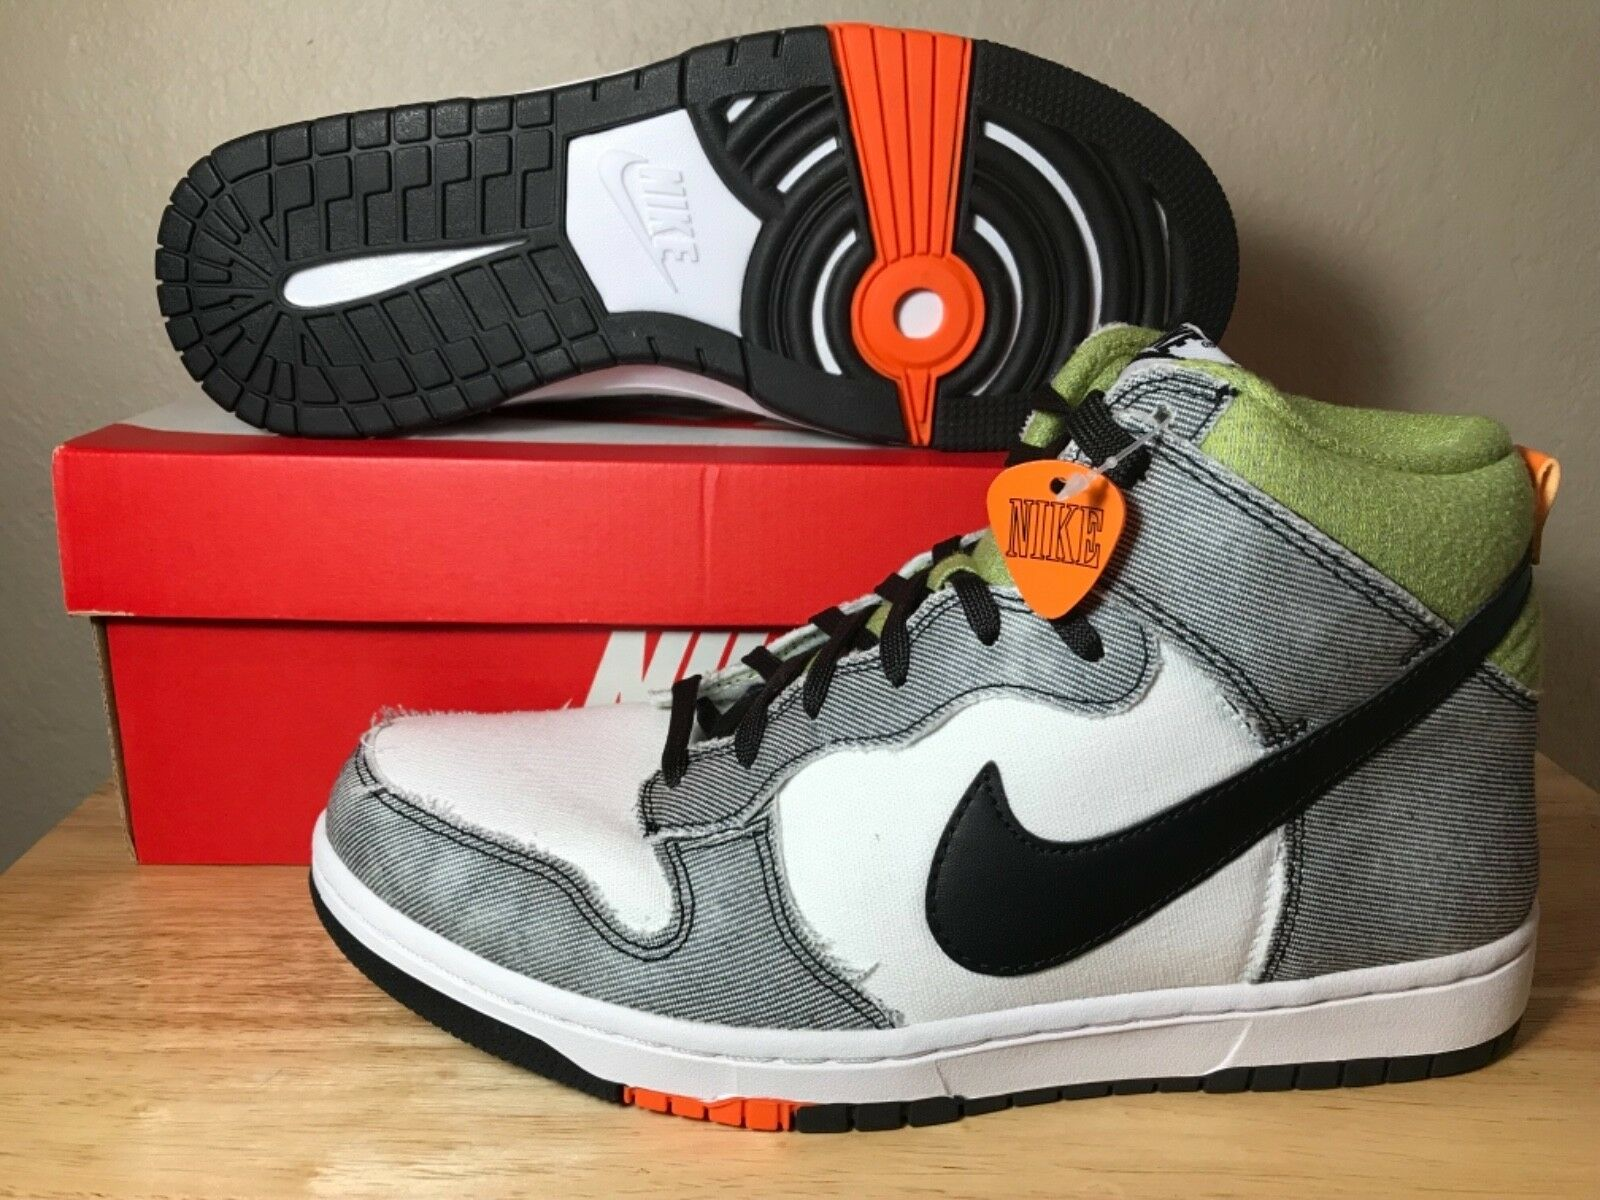 Nike Dunk CMFT White Clementine Black Mens Basketball shoes SZ New 705434-100